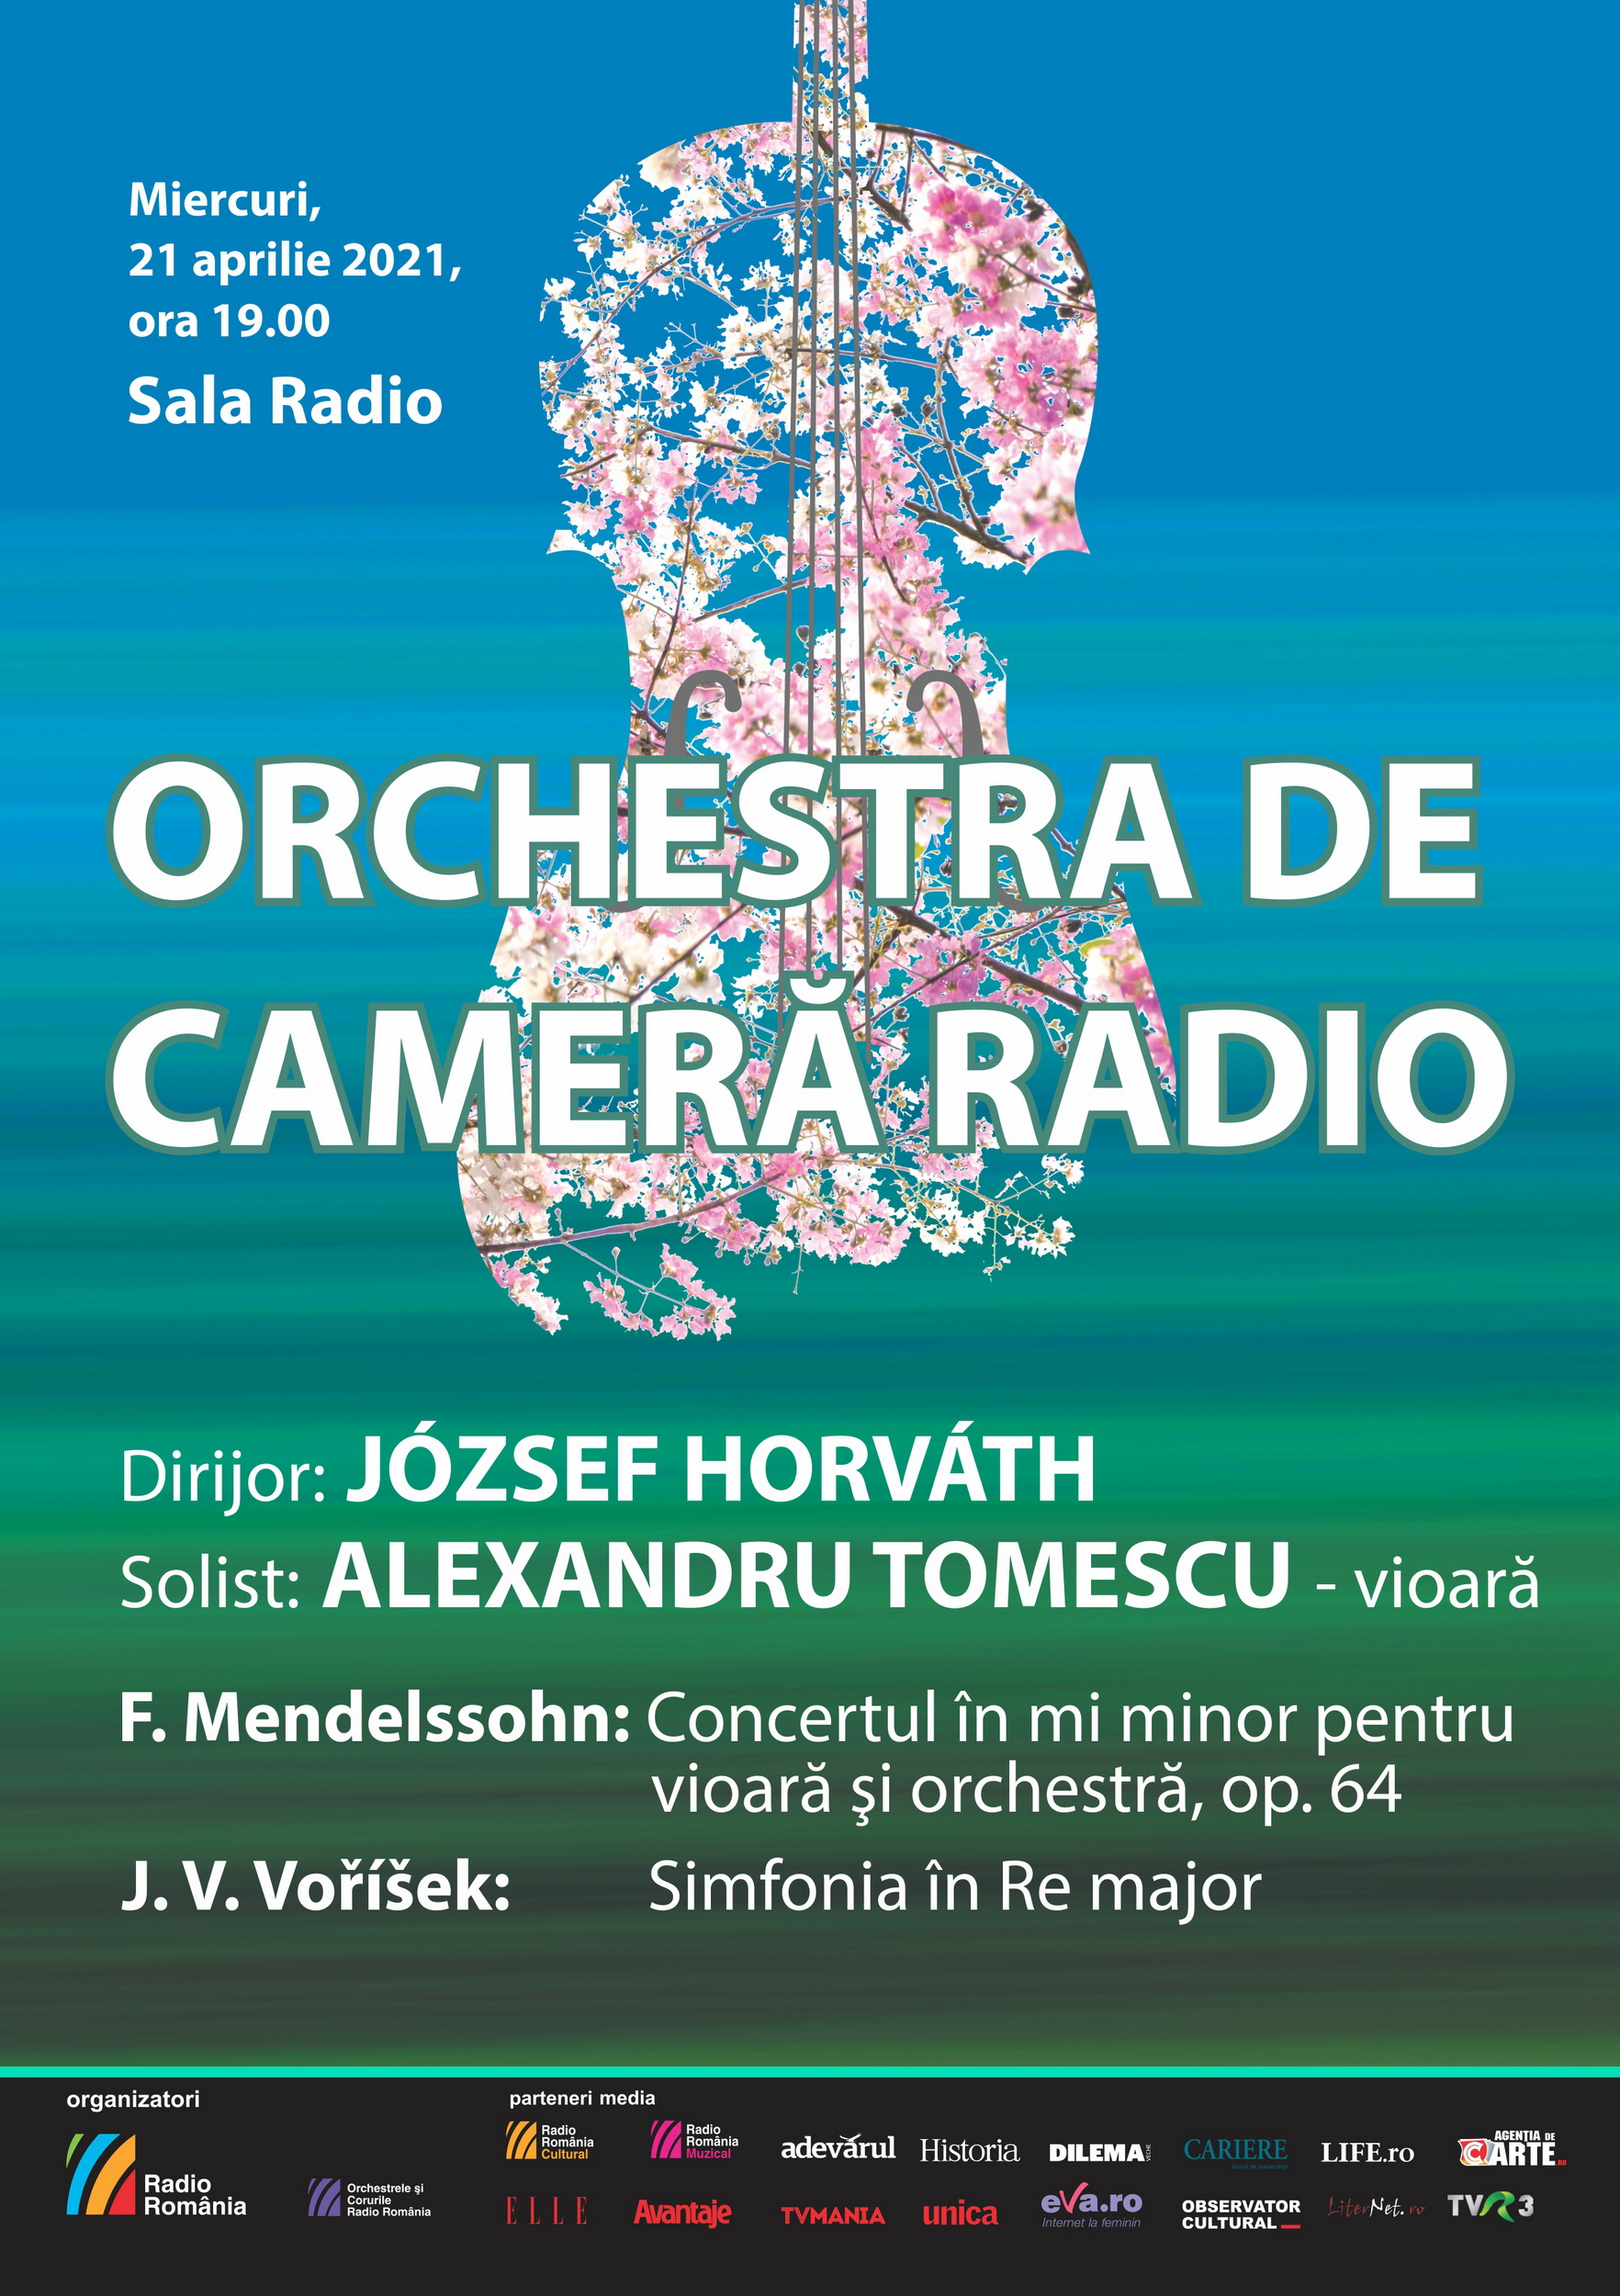 (P) ALEXANDRU TOMESCU va cânta MENDELSSOHN pe vioară STRADIVARIUS Elder-Voicu,  concert transmis LIVE de la SALA RADIO